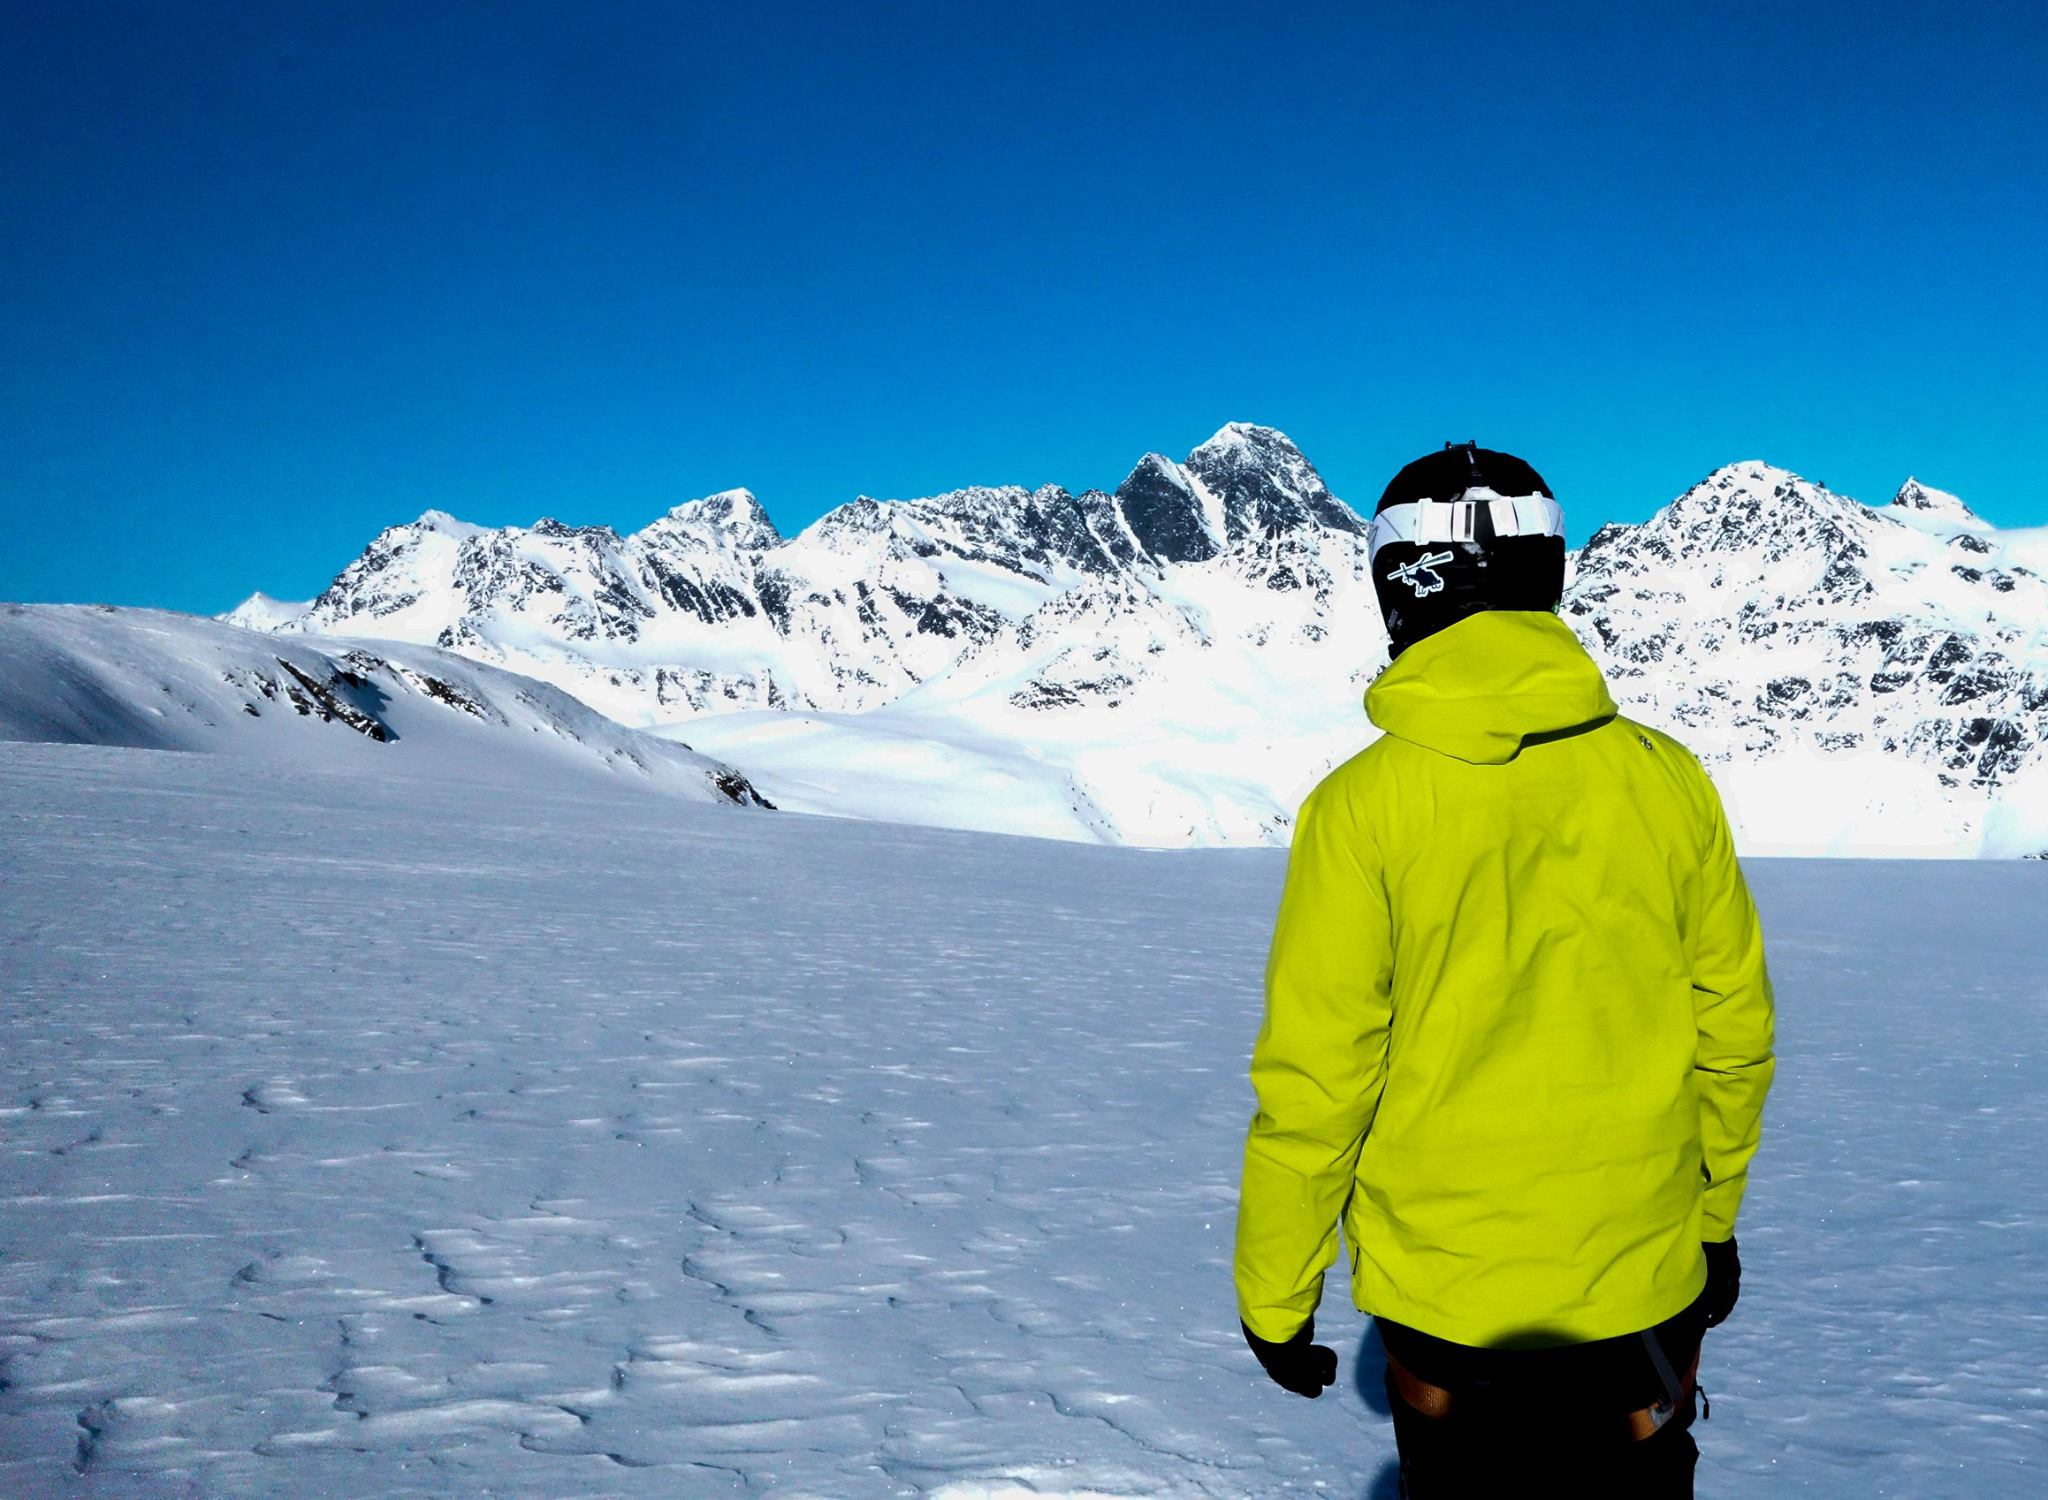 Pure Snow TJ Snowboarding in Alaska 2.jpg